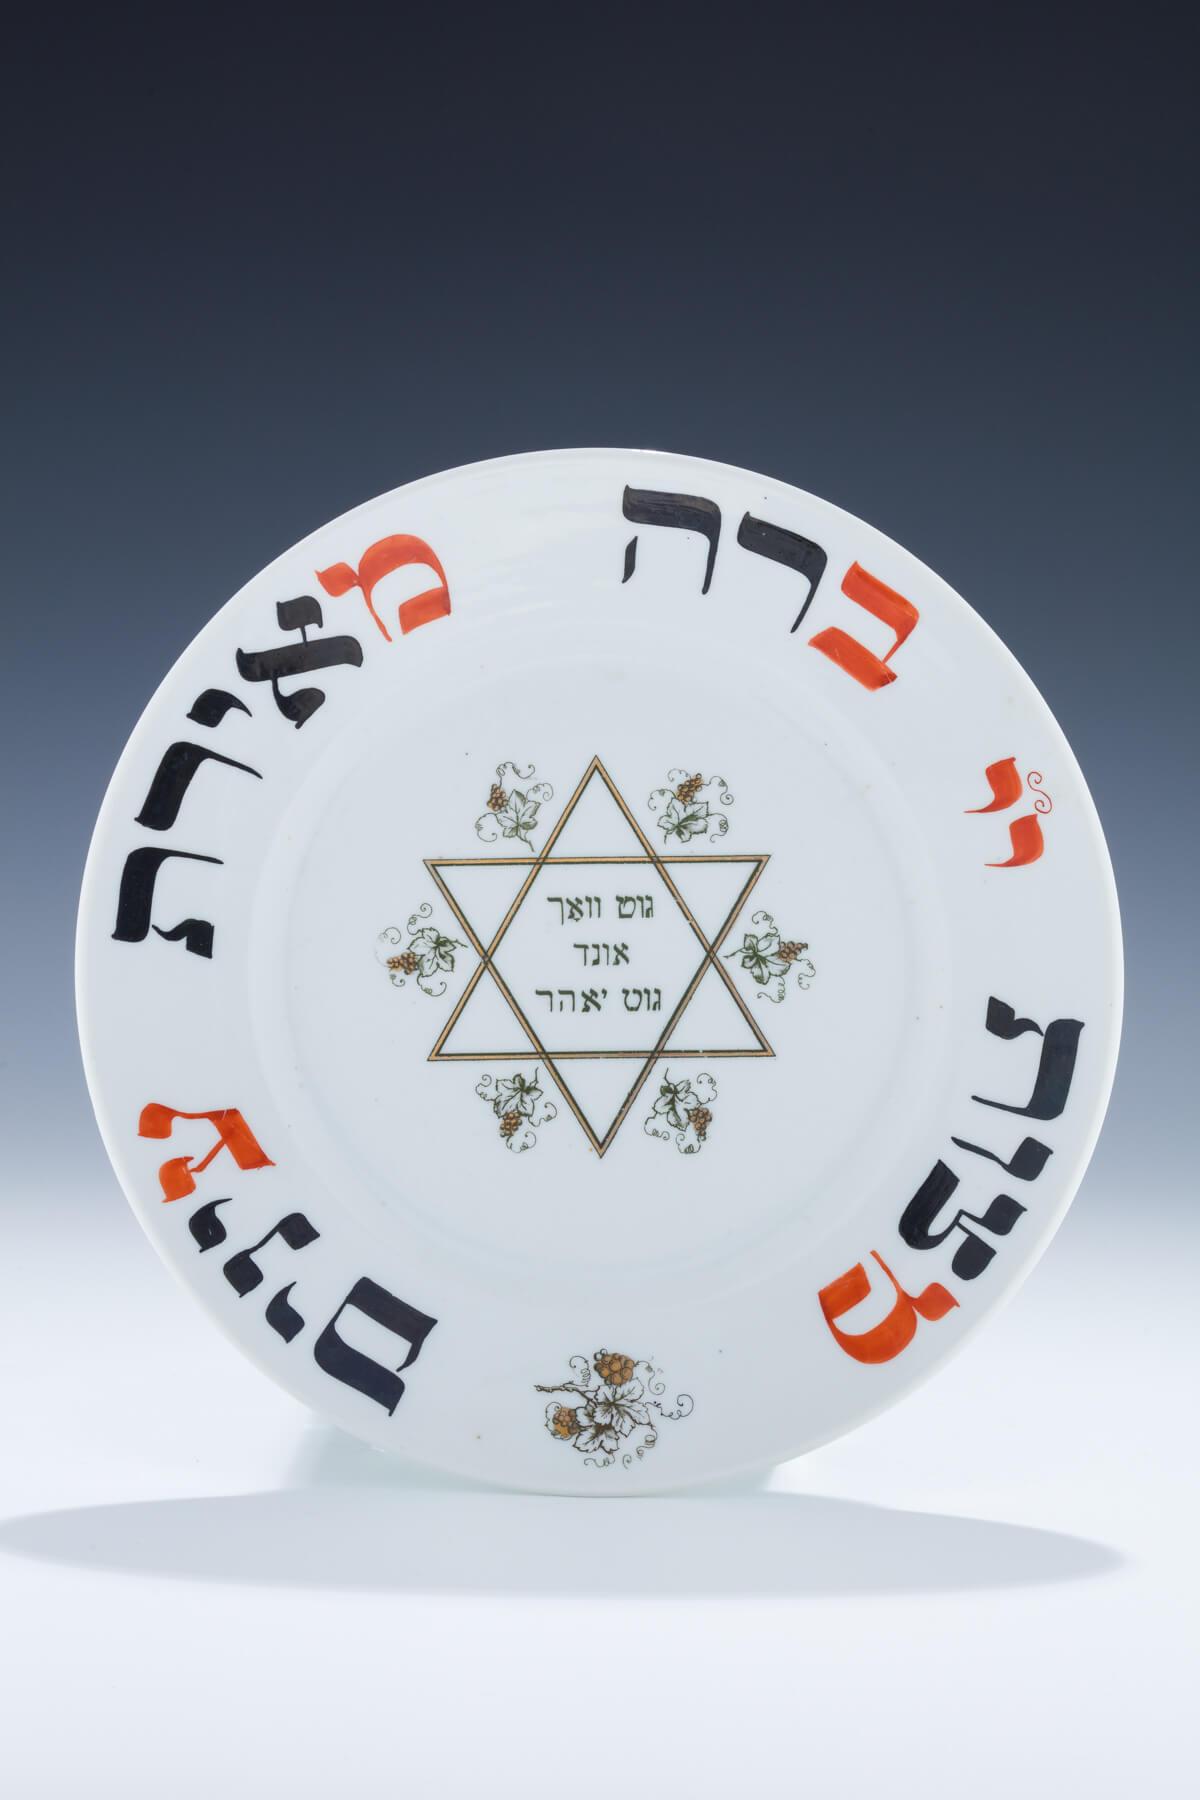 078. A Ceramic Havdalah Plate